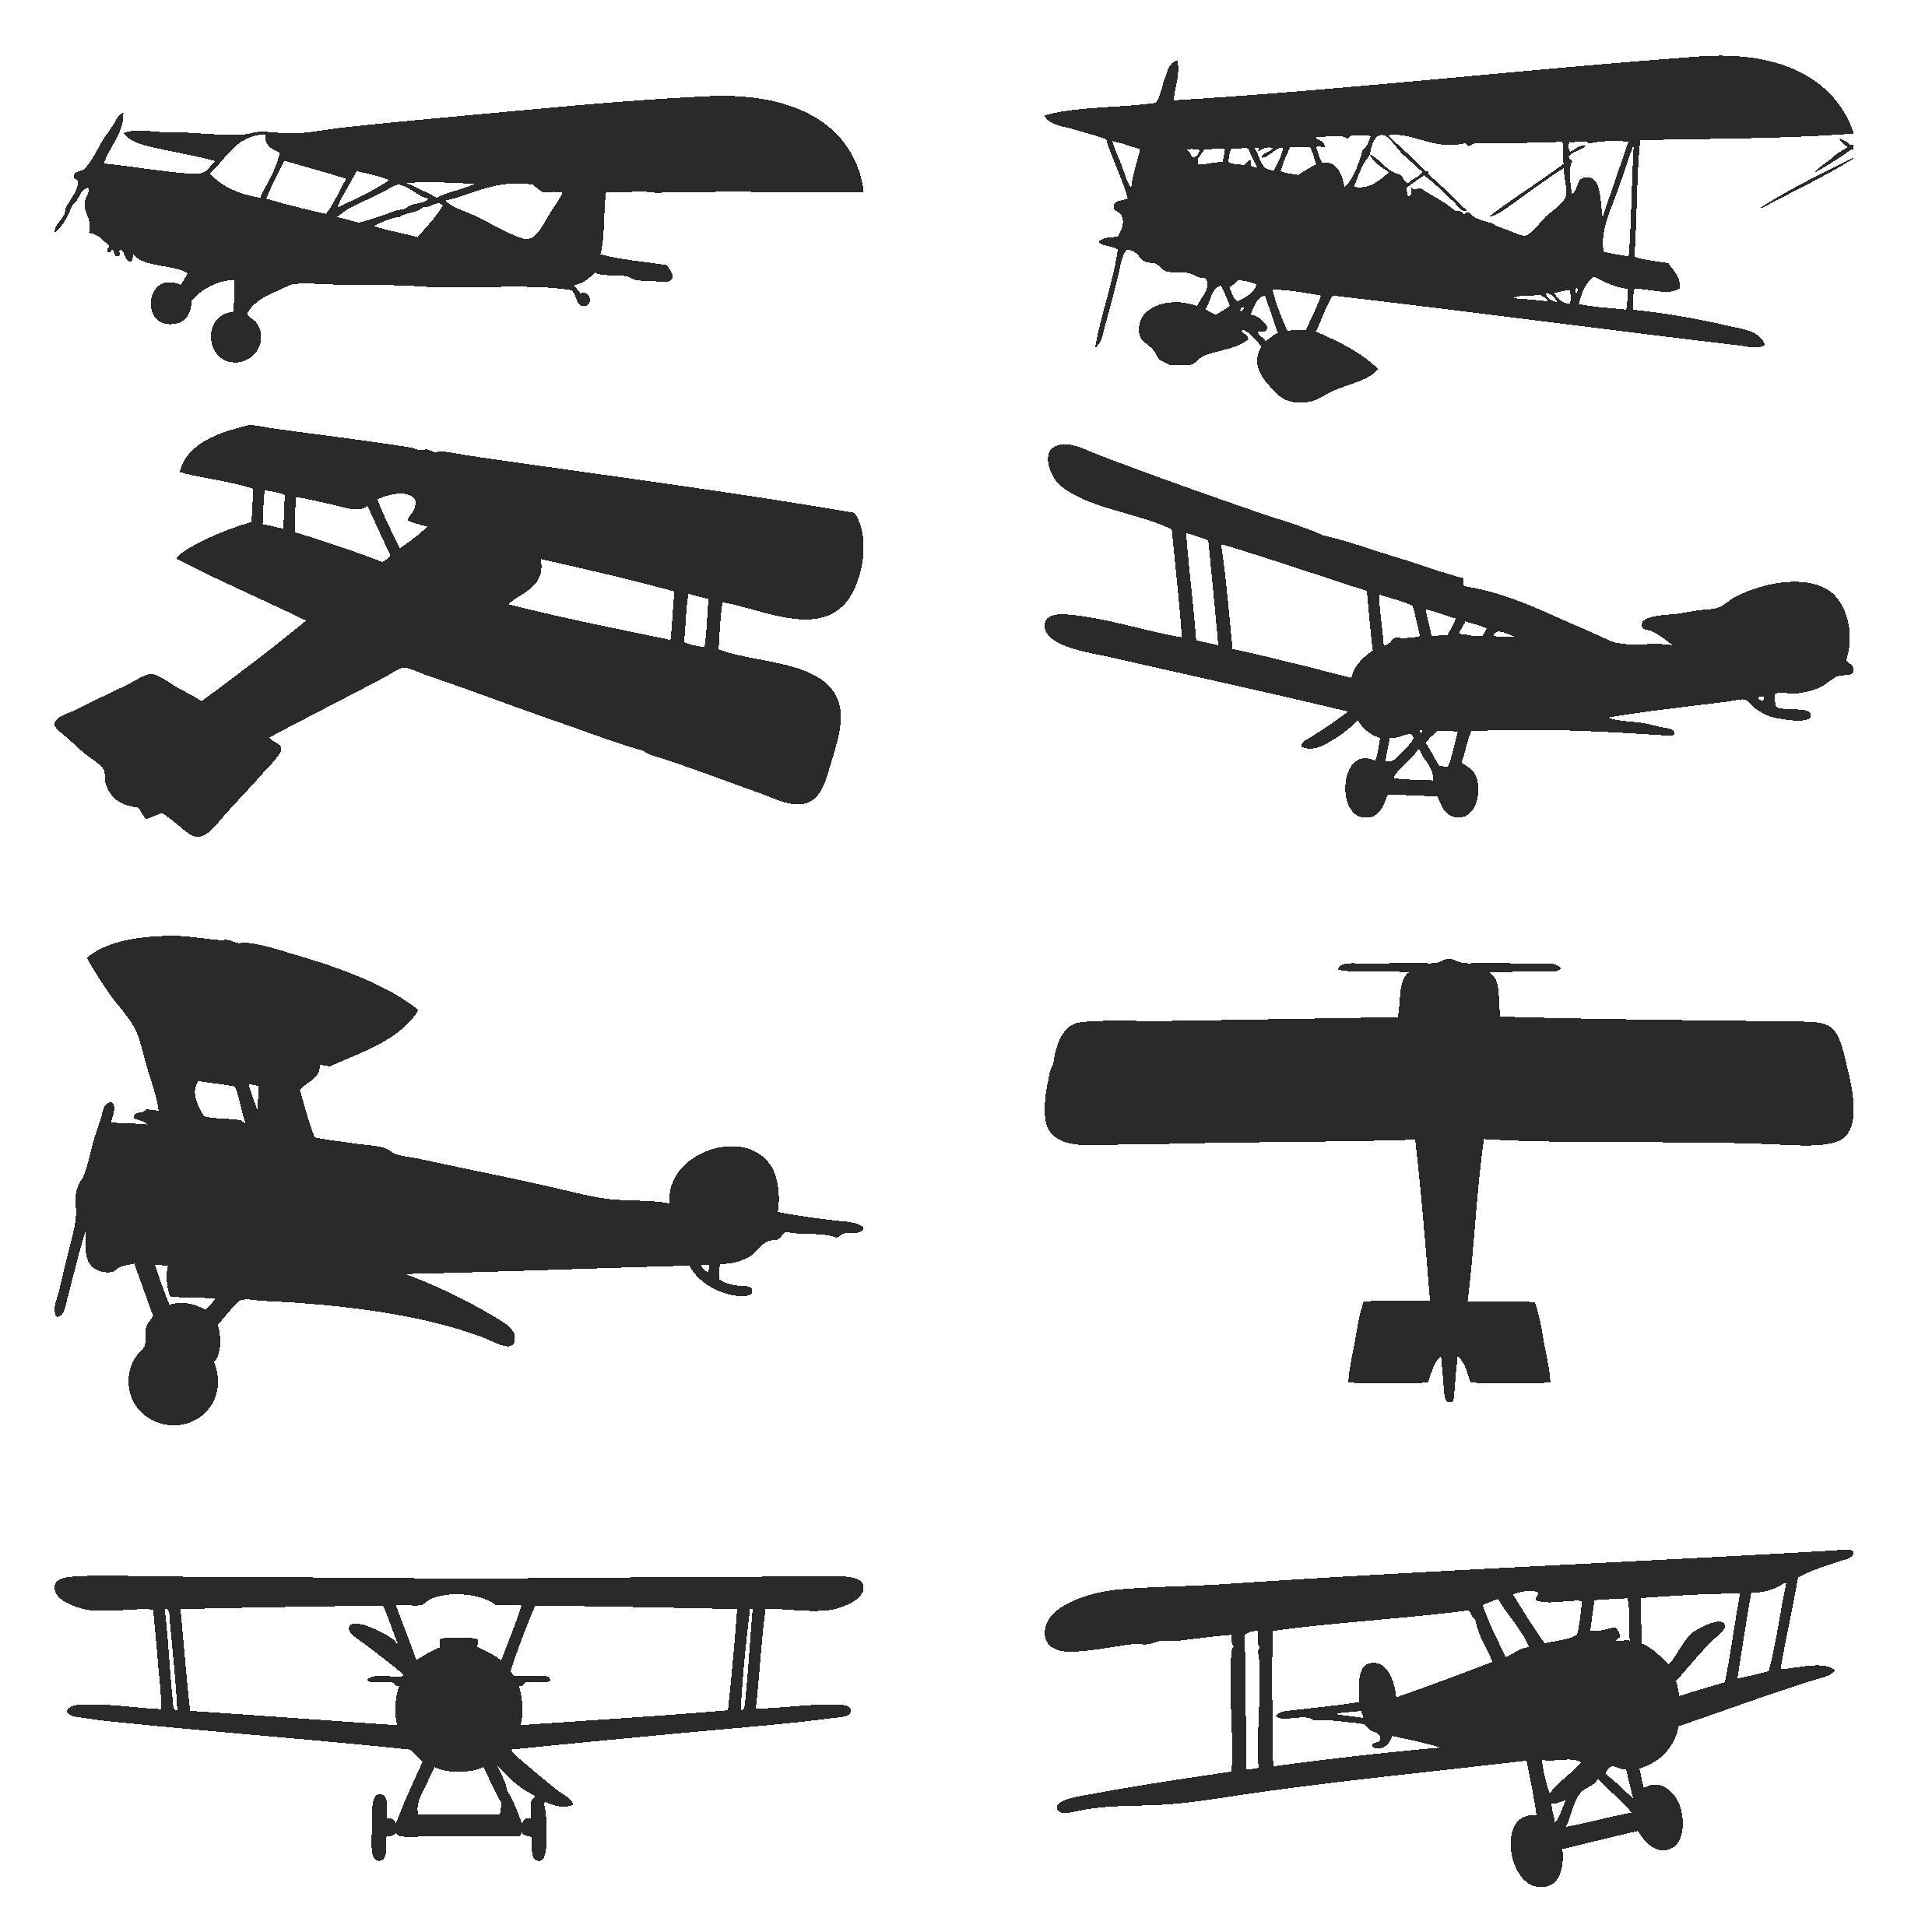 Vector Silhouettes Of Biplanes Free CDR Vectors Art